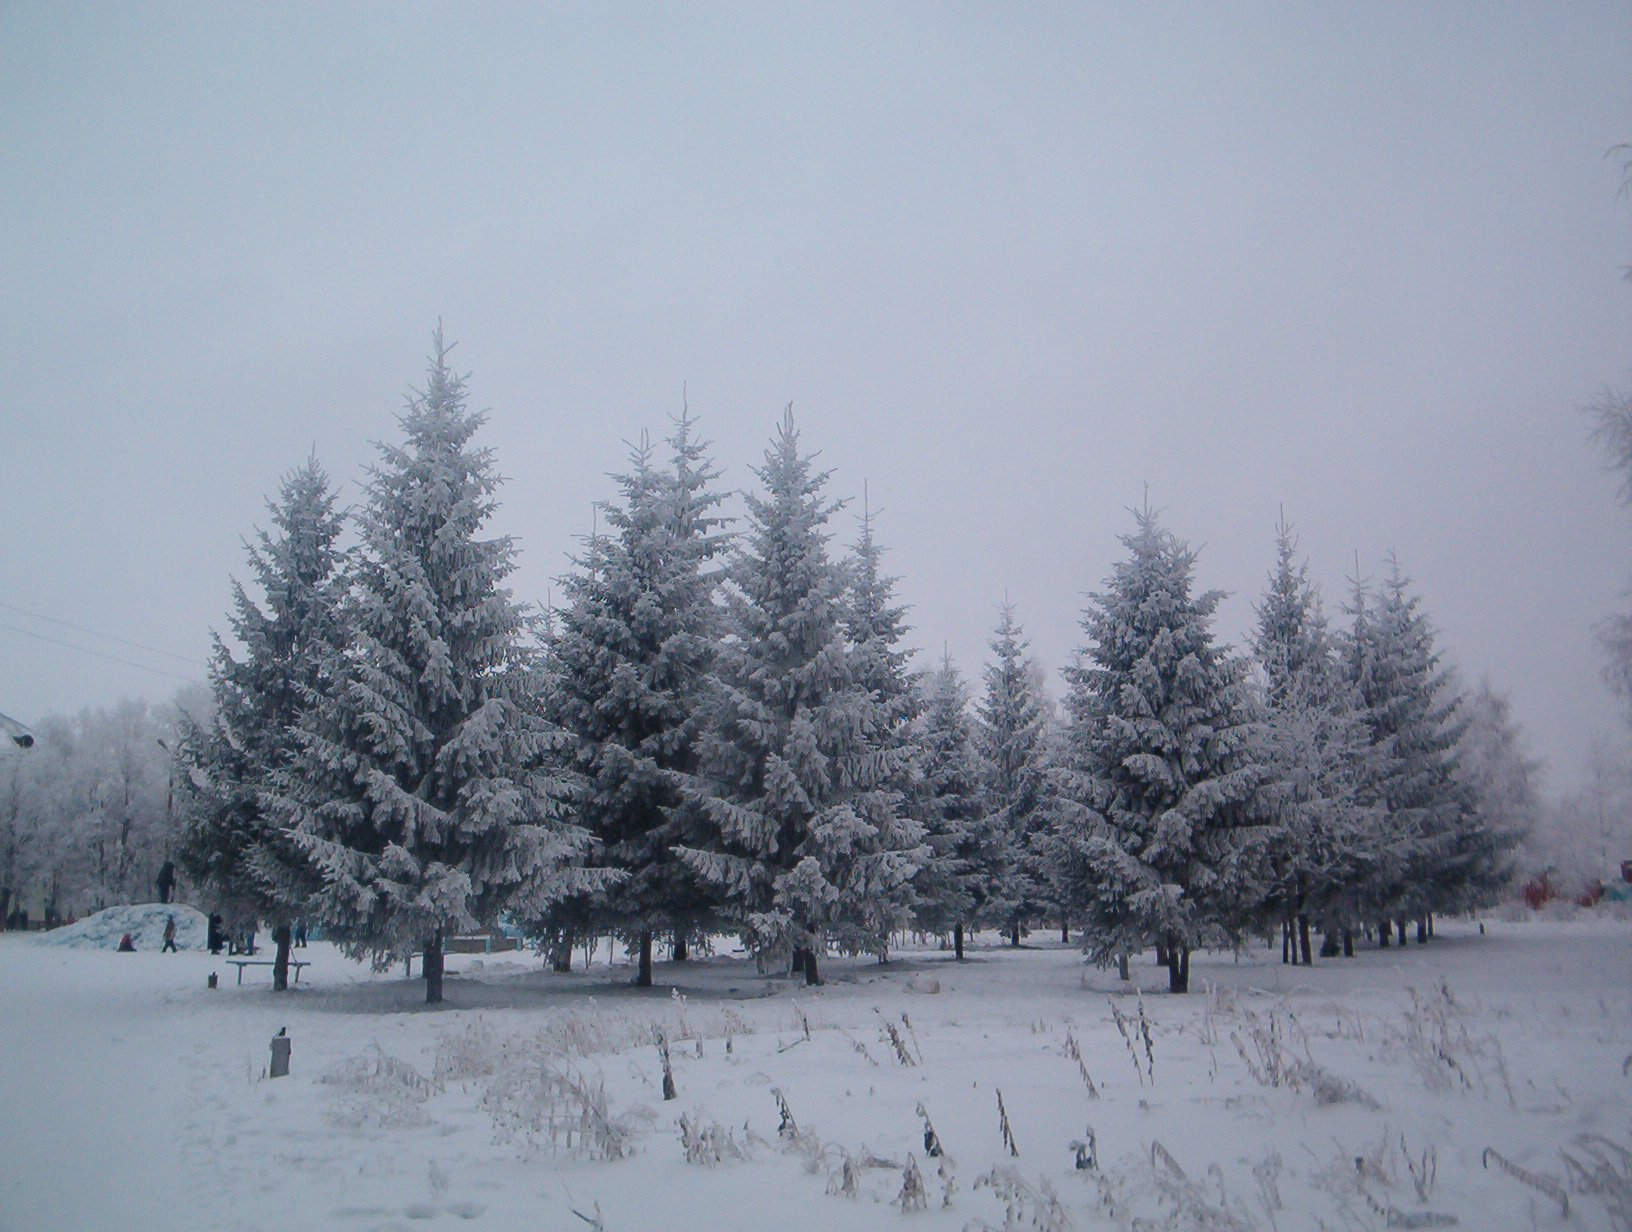 Фото Петра-Дубравы C288d4ba3850